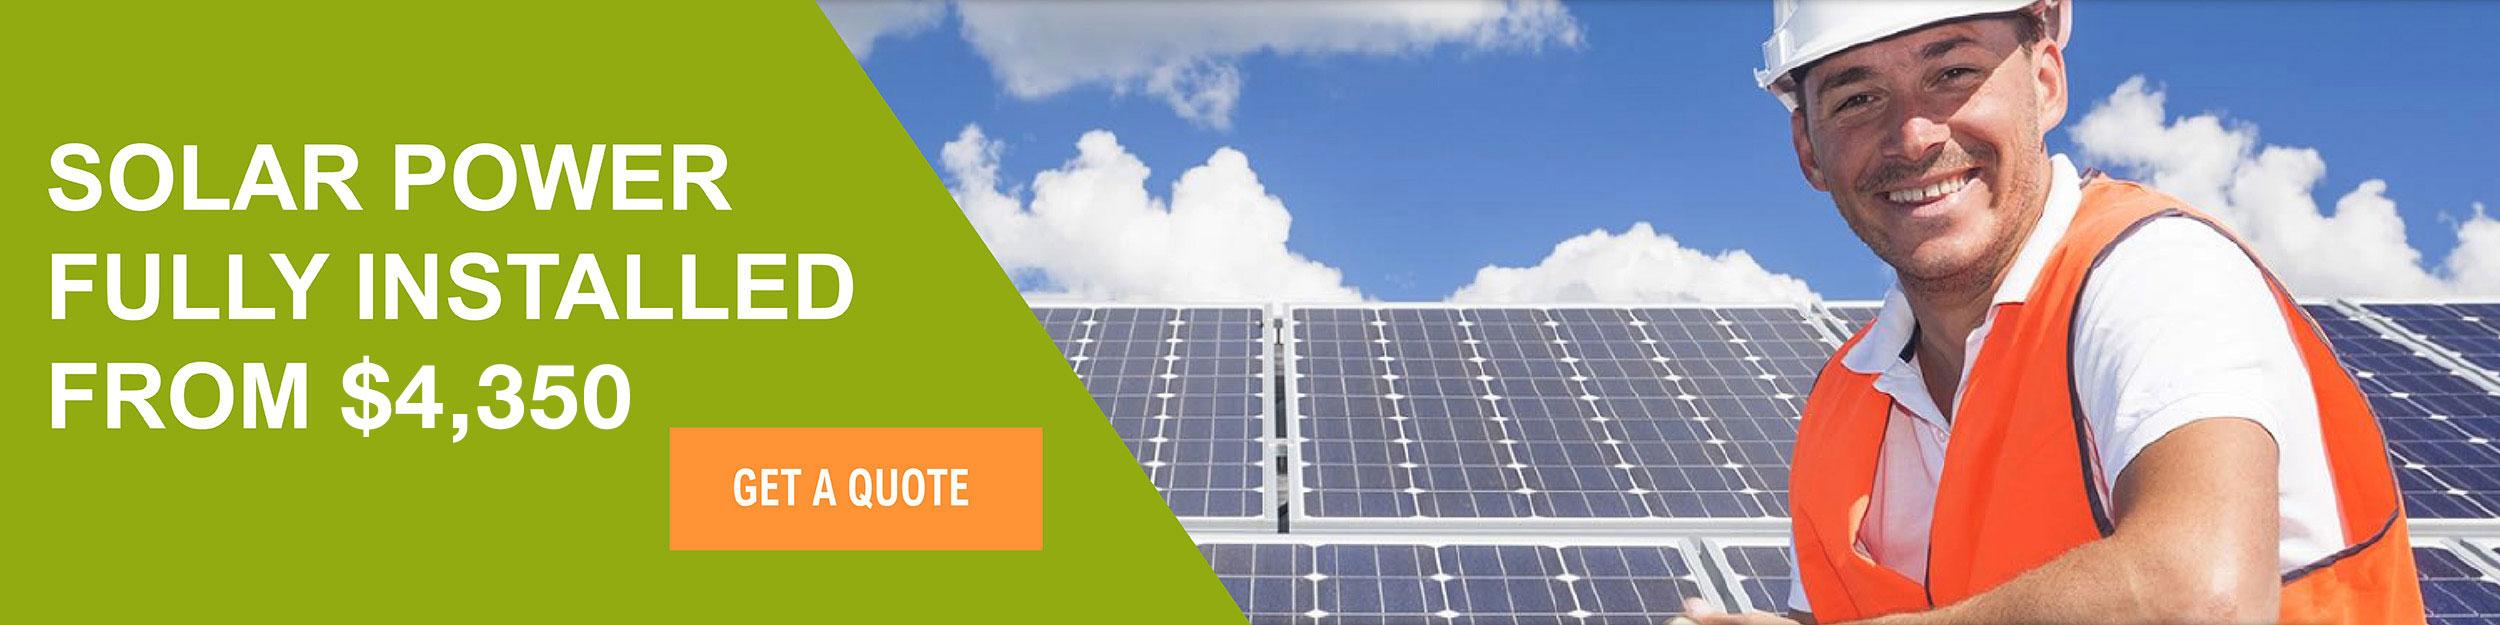 Renew Energy Solar Panels Perth Solar Systems ☀️